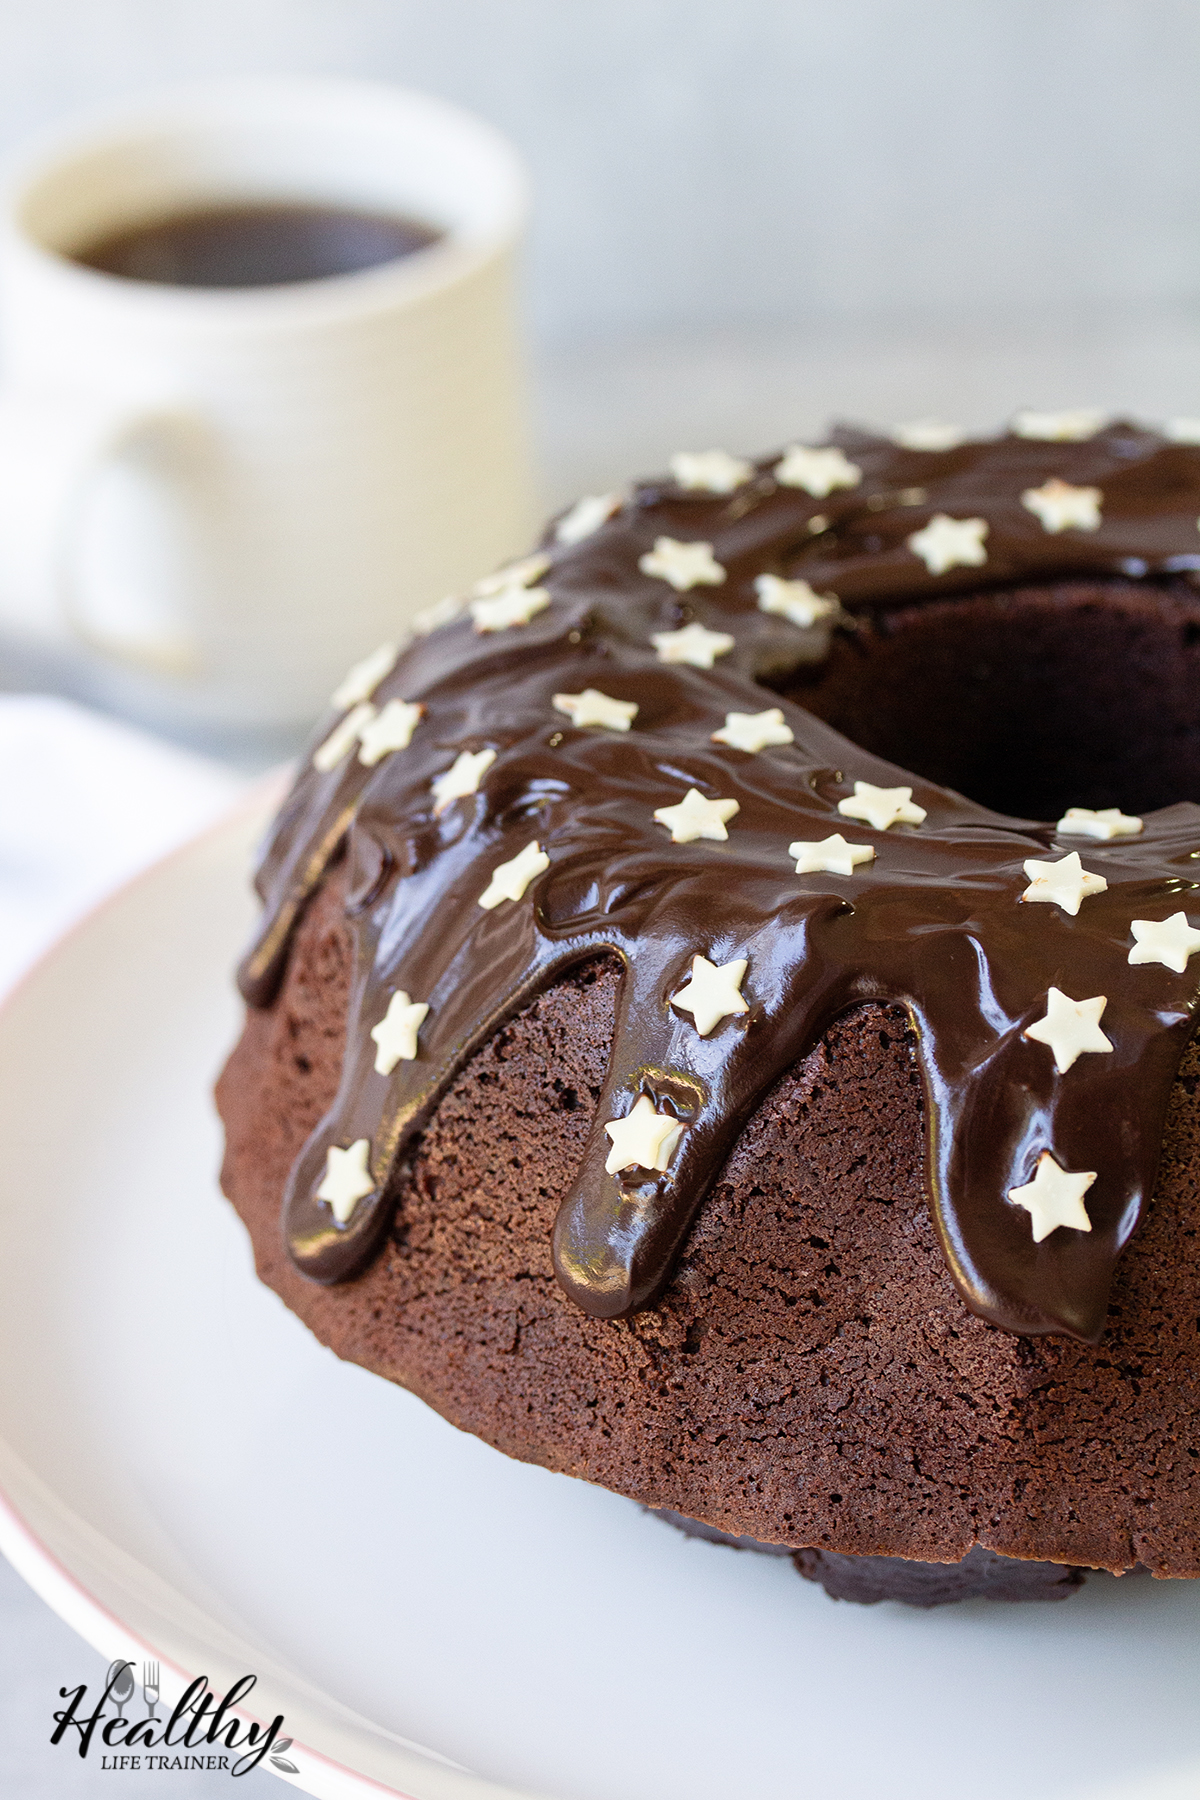 Chocolate Sour Cream Bundt Cake With Ganache